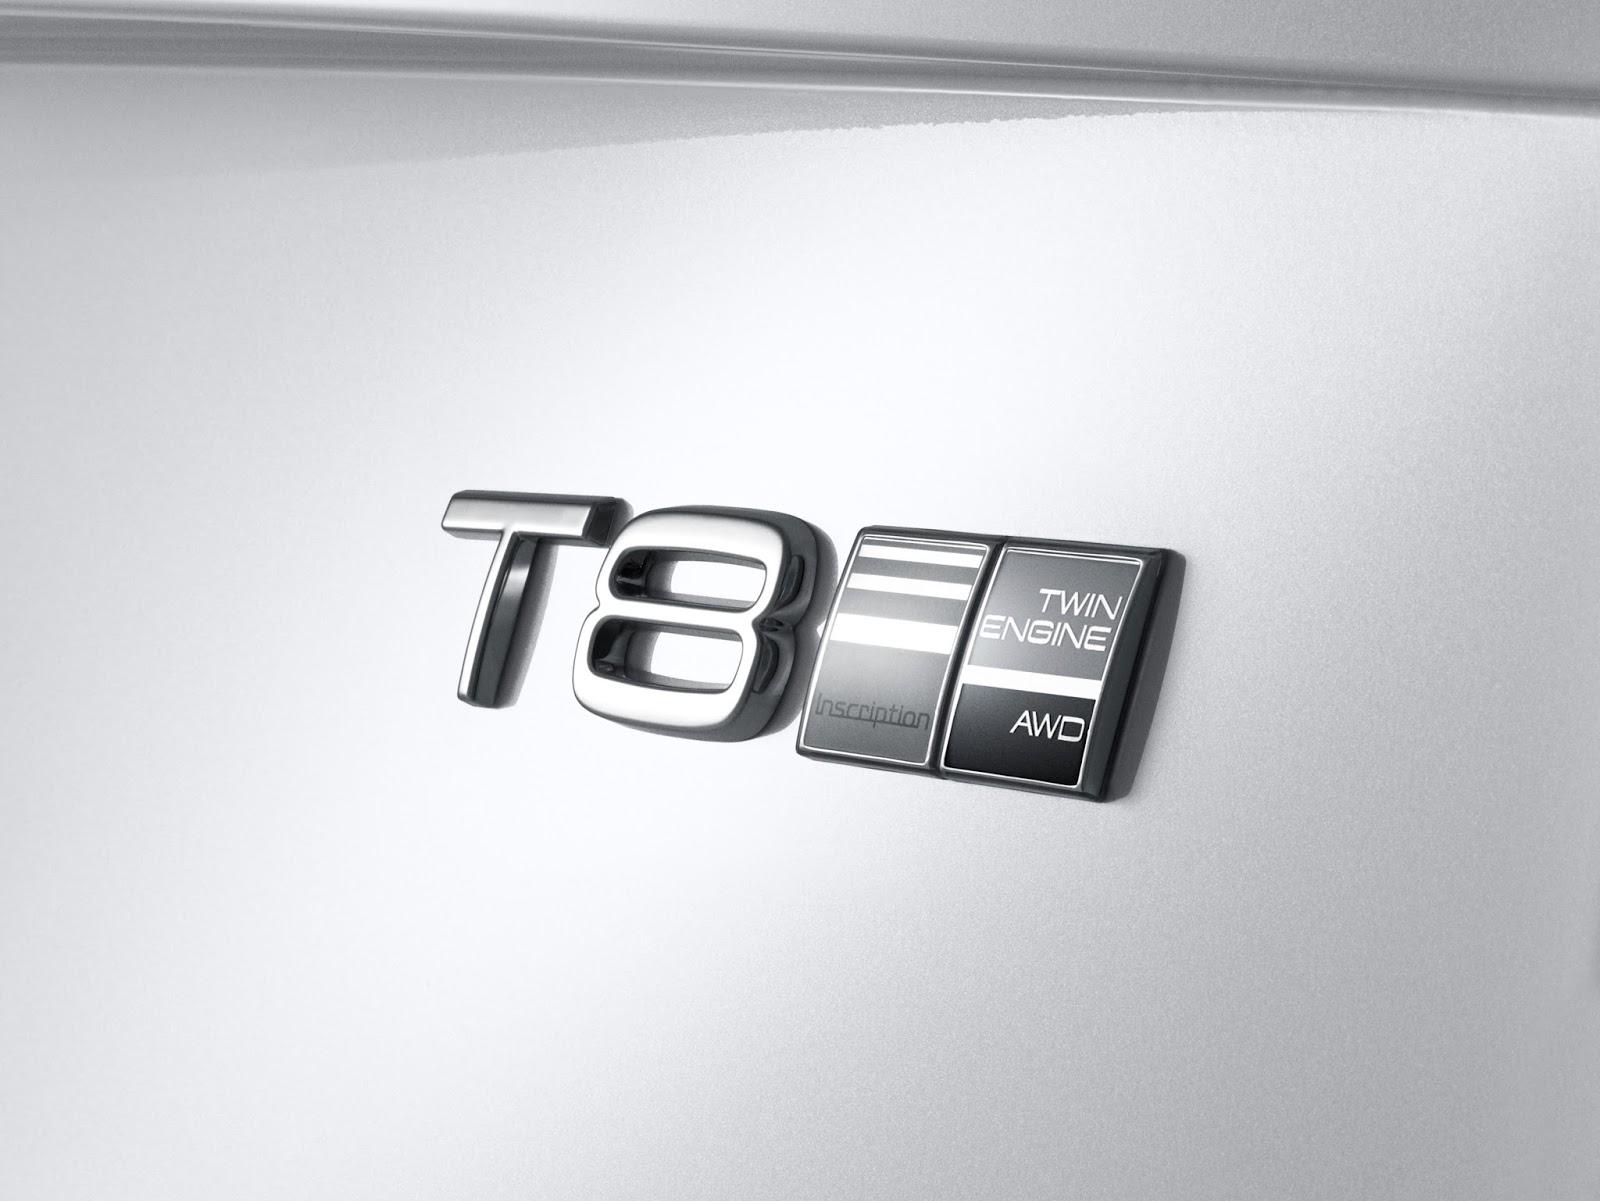 170170 Emblem Twin Engine T8 Volvo S90 Inscription White Το νέο Volvo S90 έρχεται και βάζει φωτιά στον ανταγωνισμό premium sedan, Volvo, Volvo Cars, Volvo S90